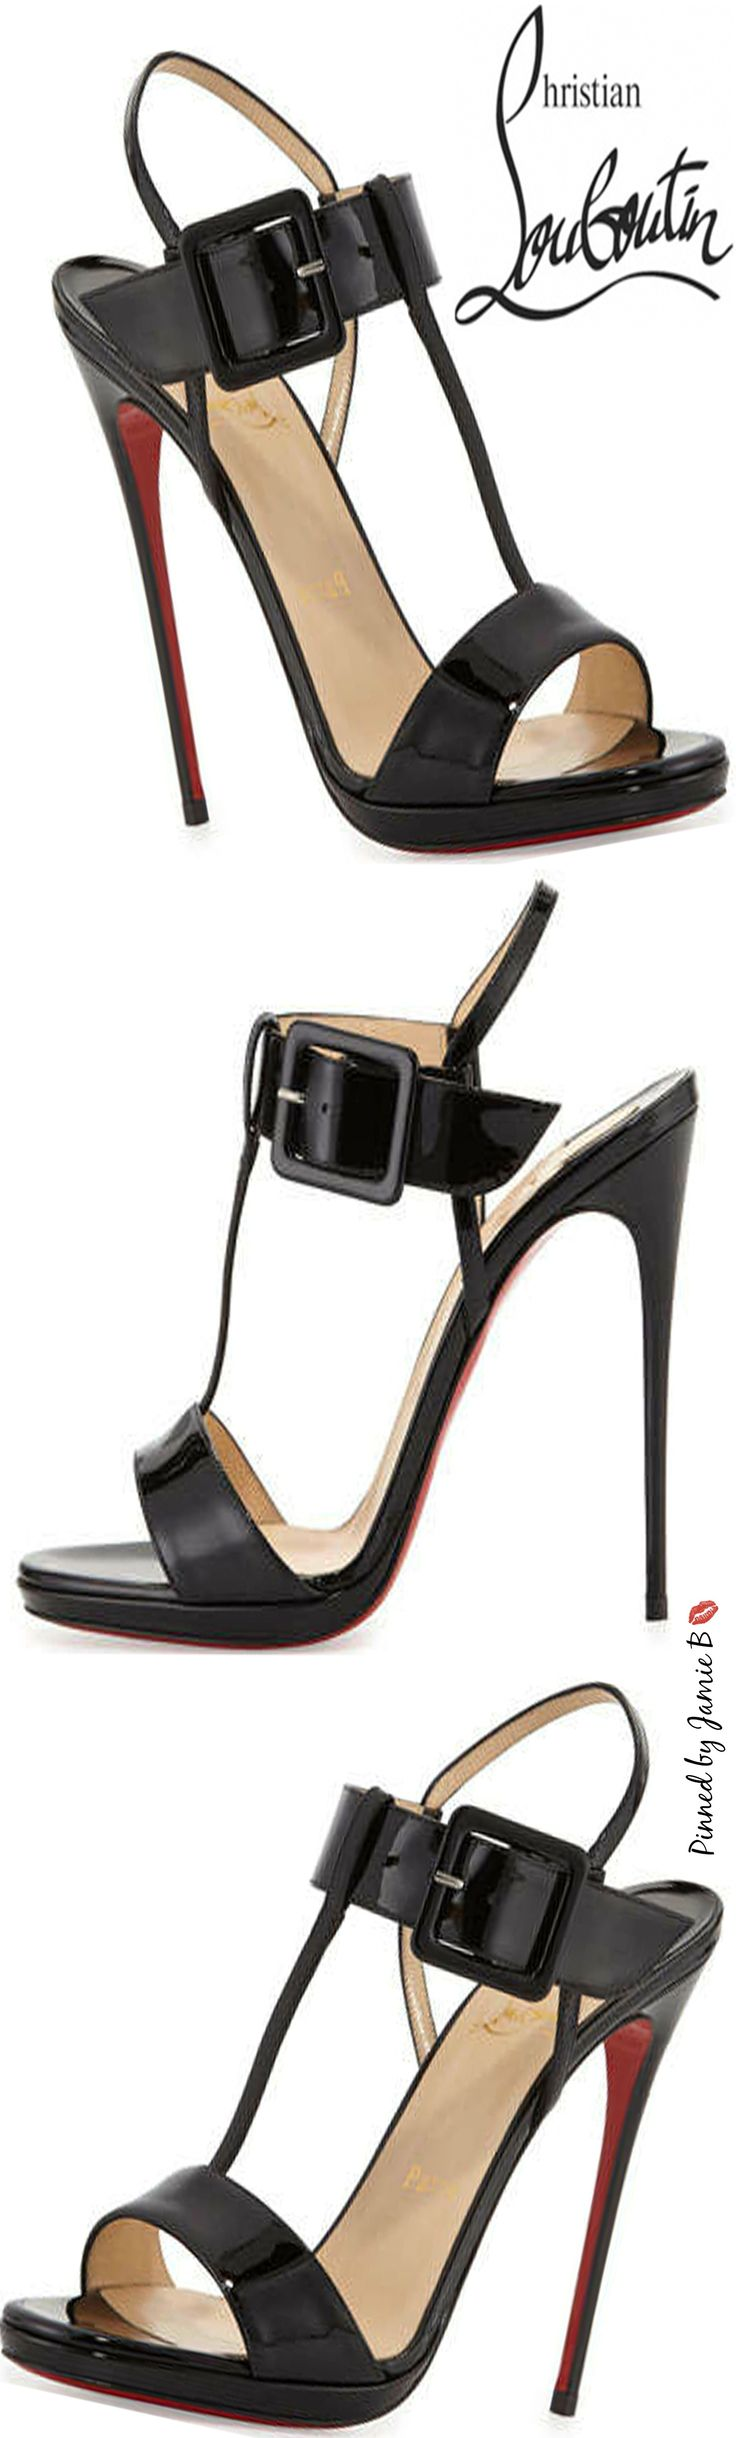 Christian Louboutin | Beltega Patent Red Sole Sandal | Jamie B